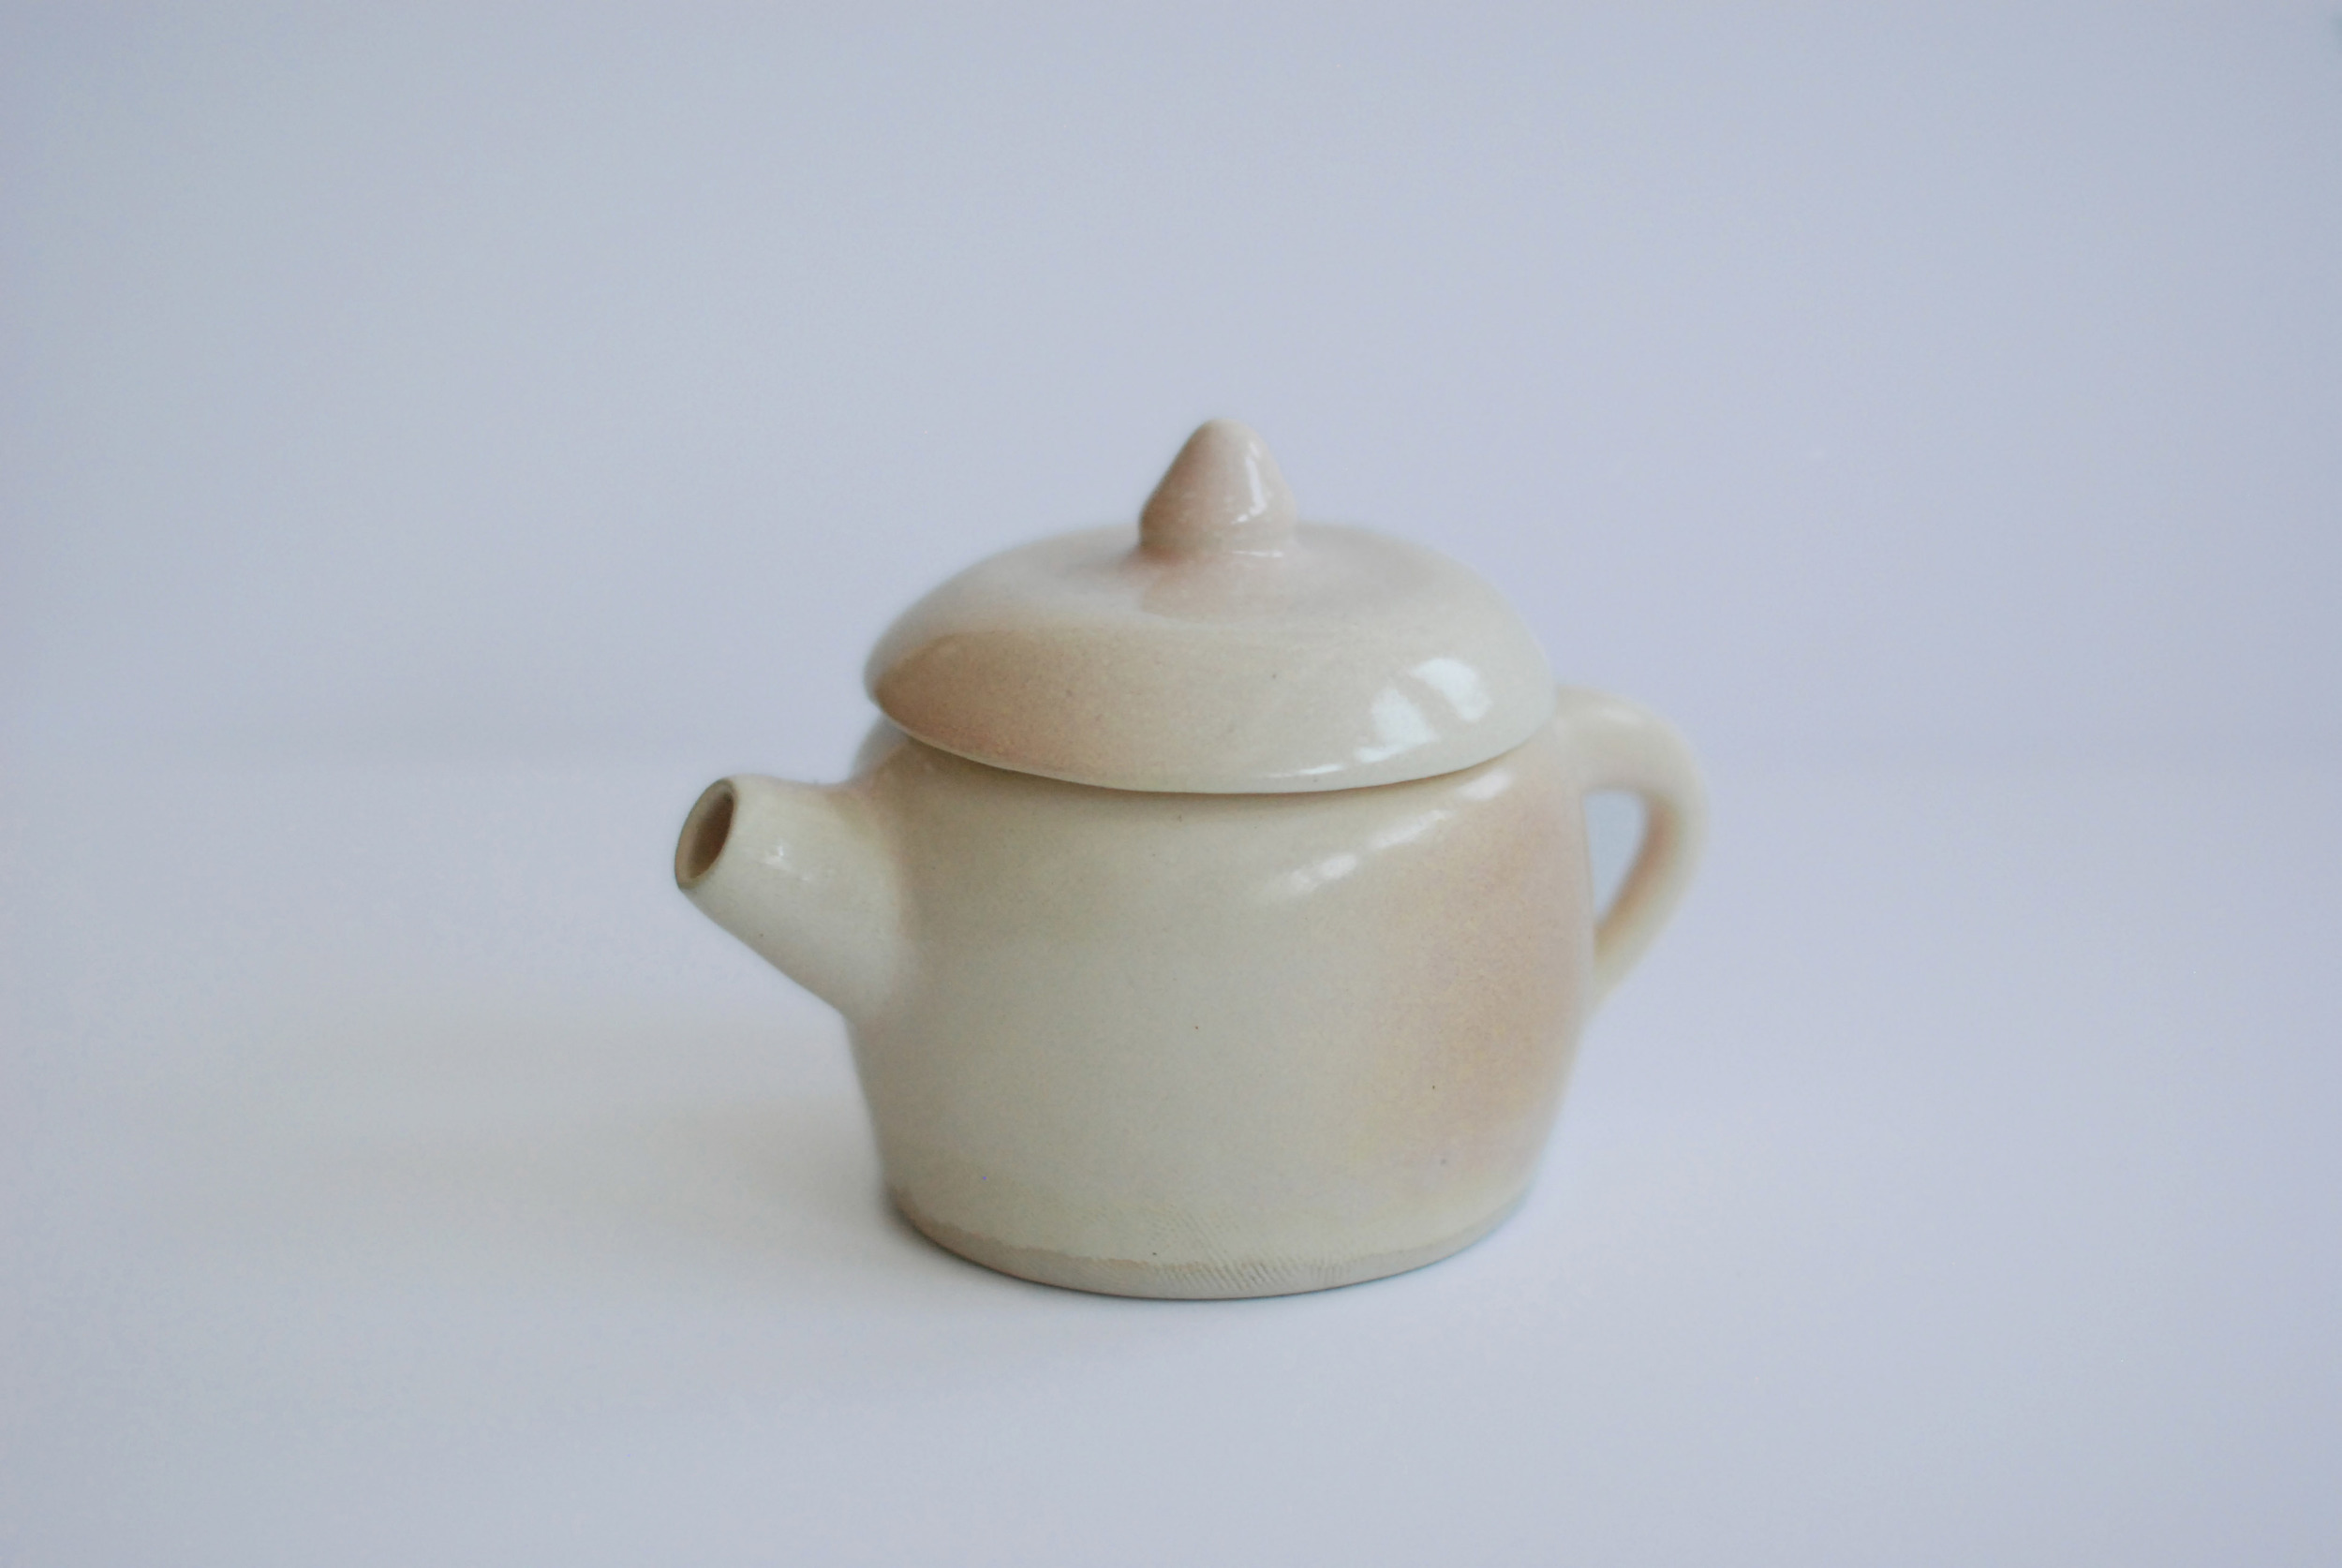 Almond_Teapot_02_Q9.jpg